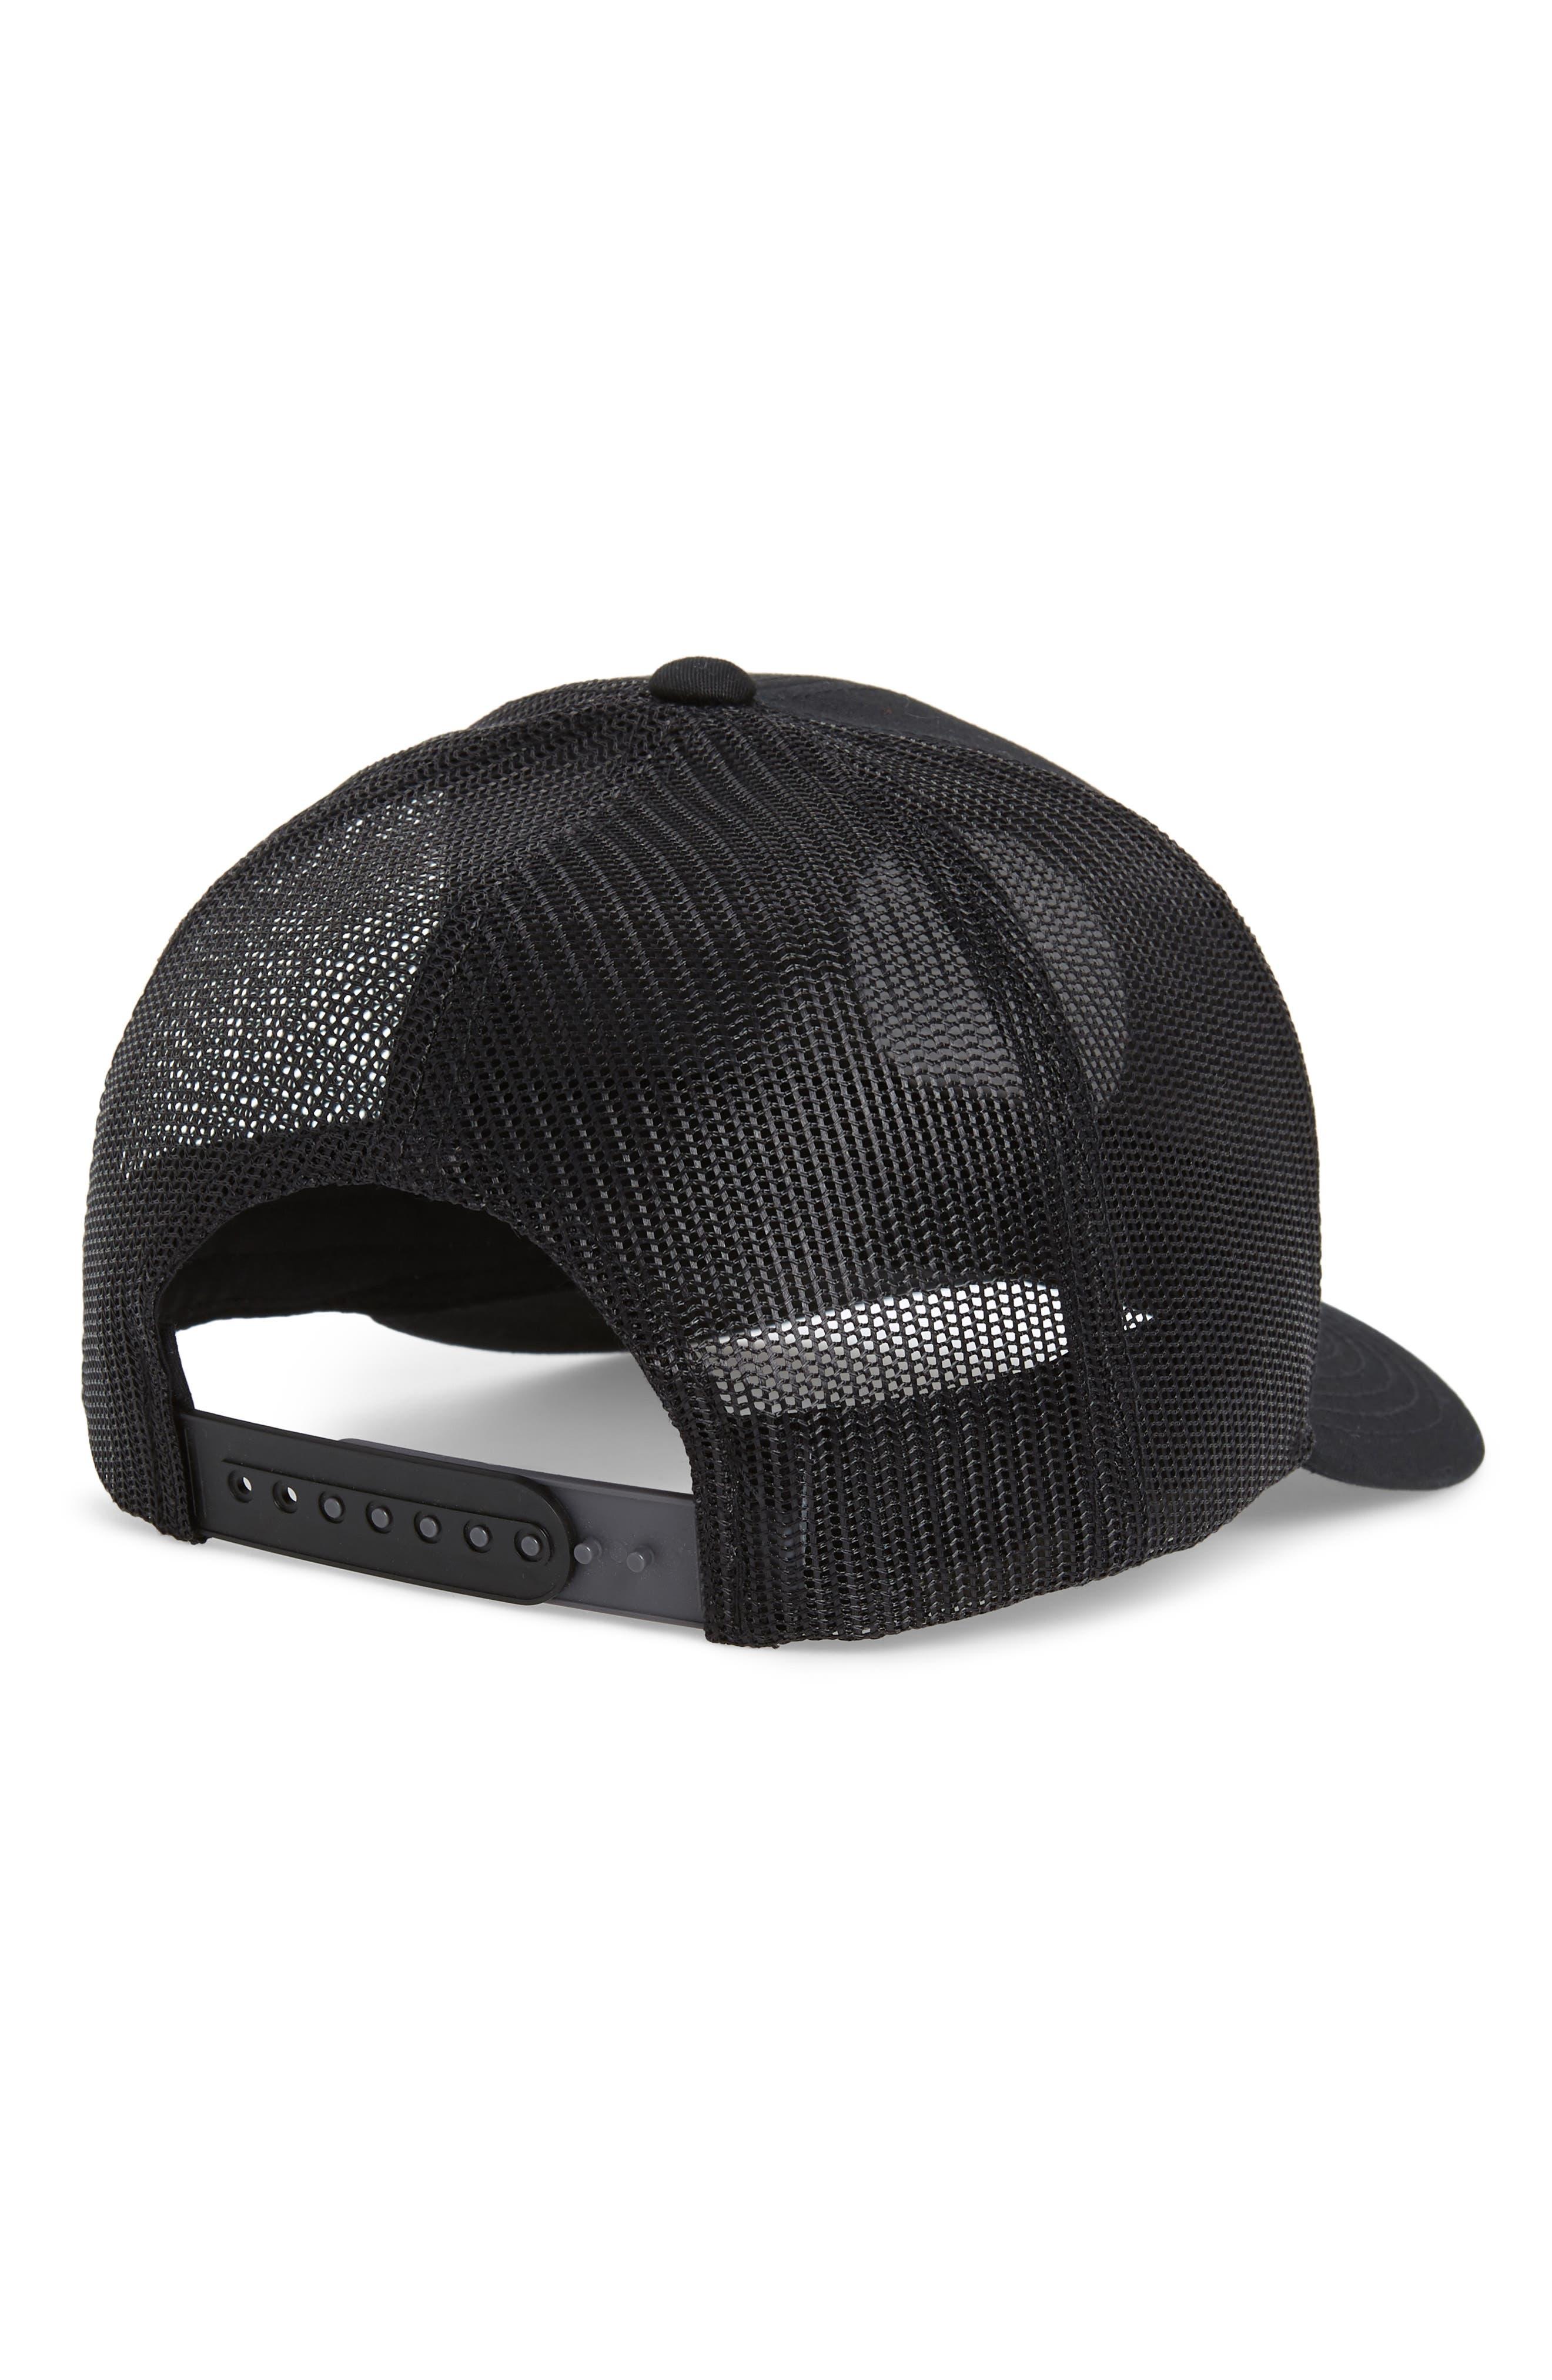 Claery Trucker Hat,                             Alternate thumbnail 2, color,                             Black